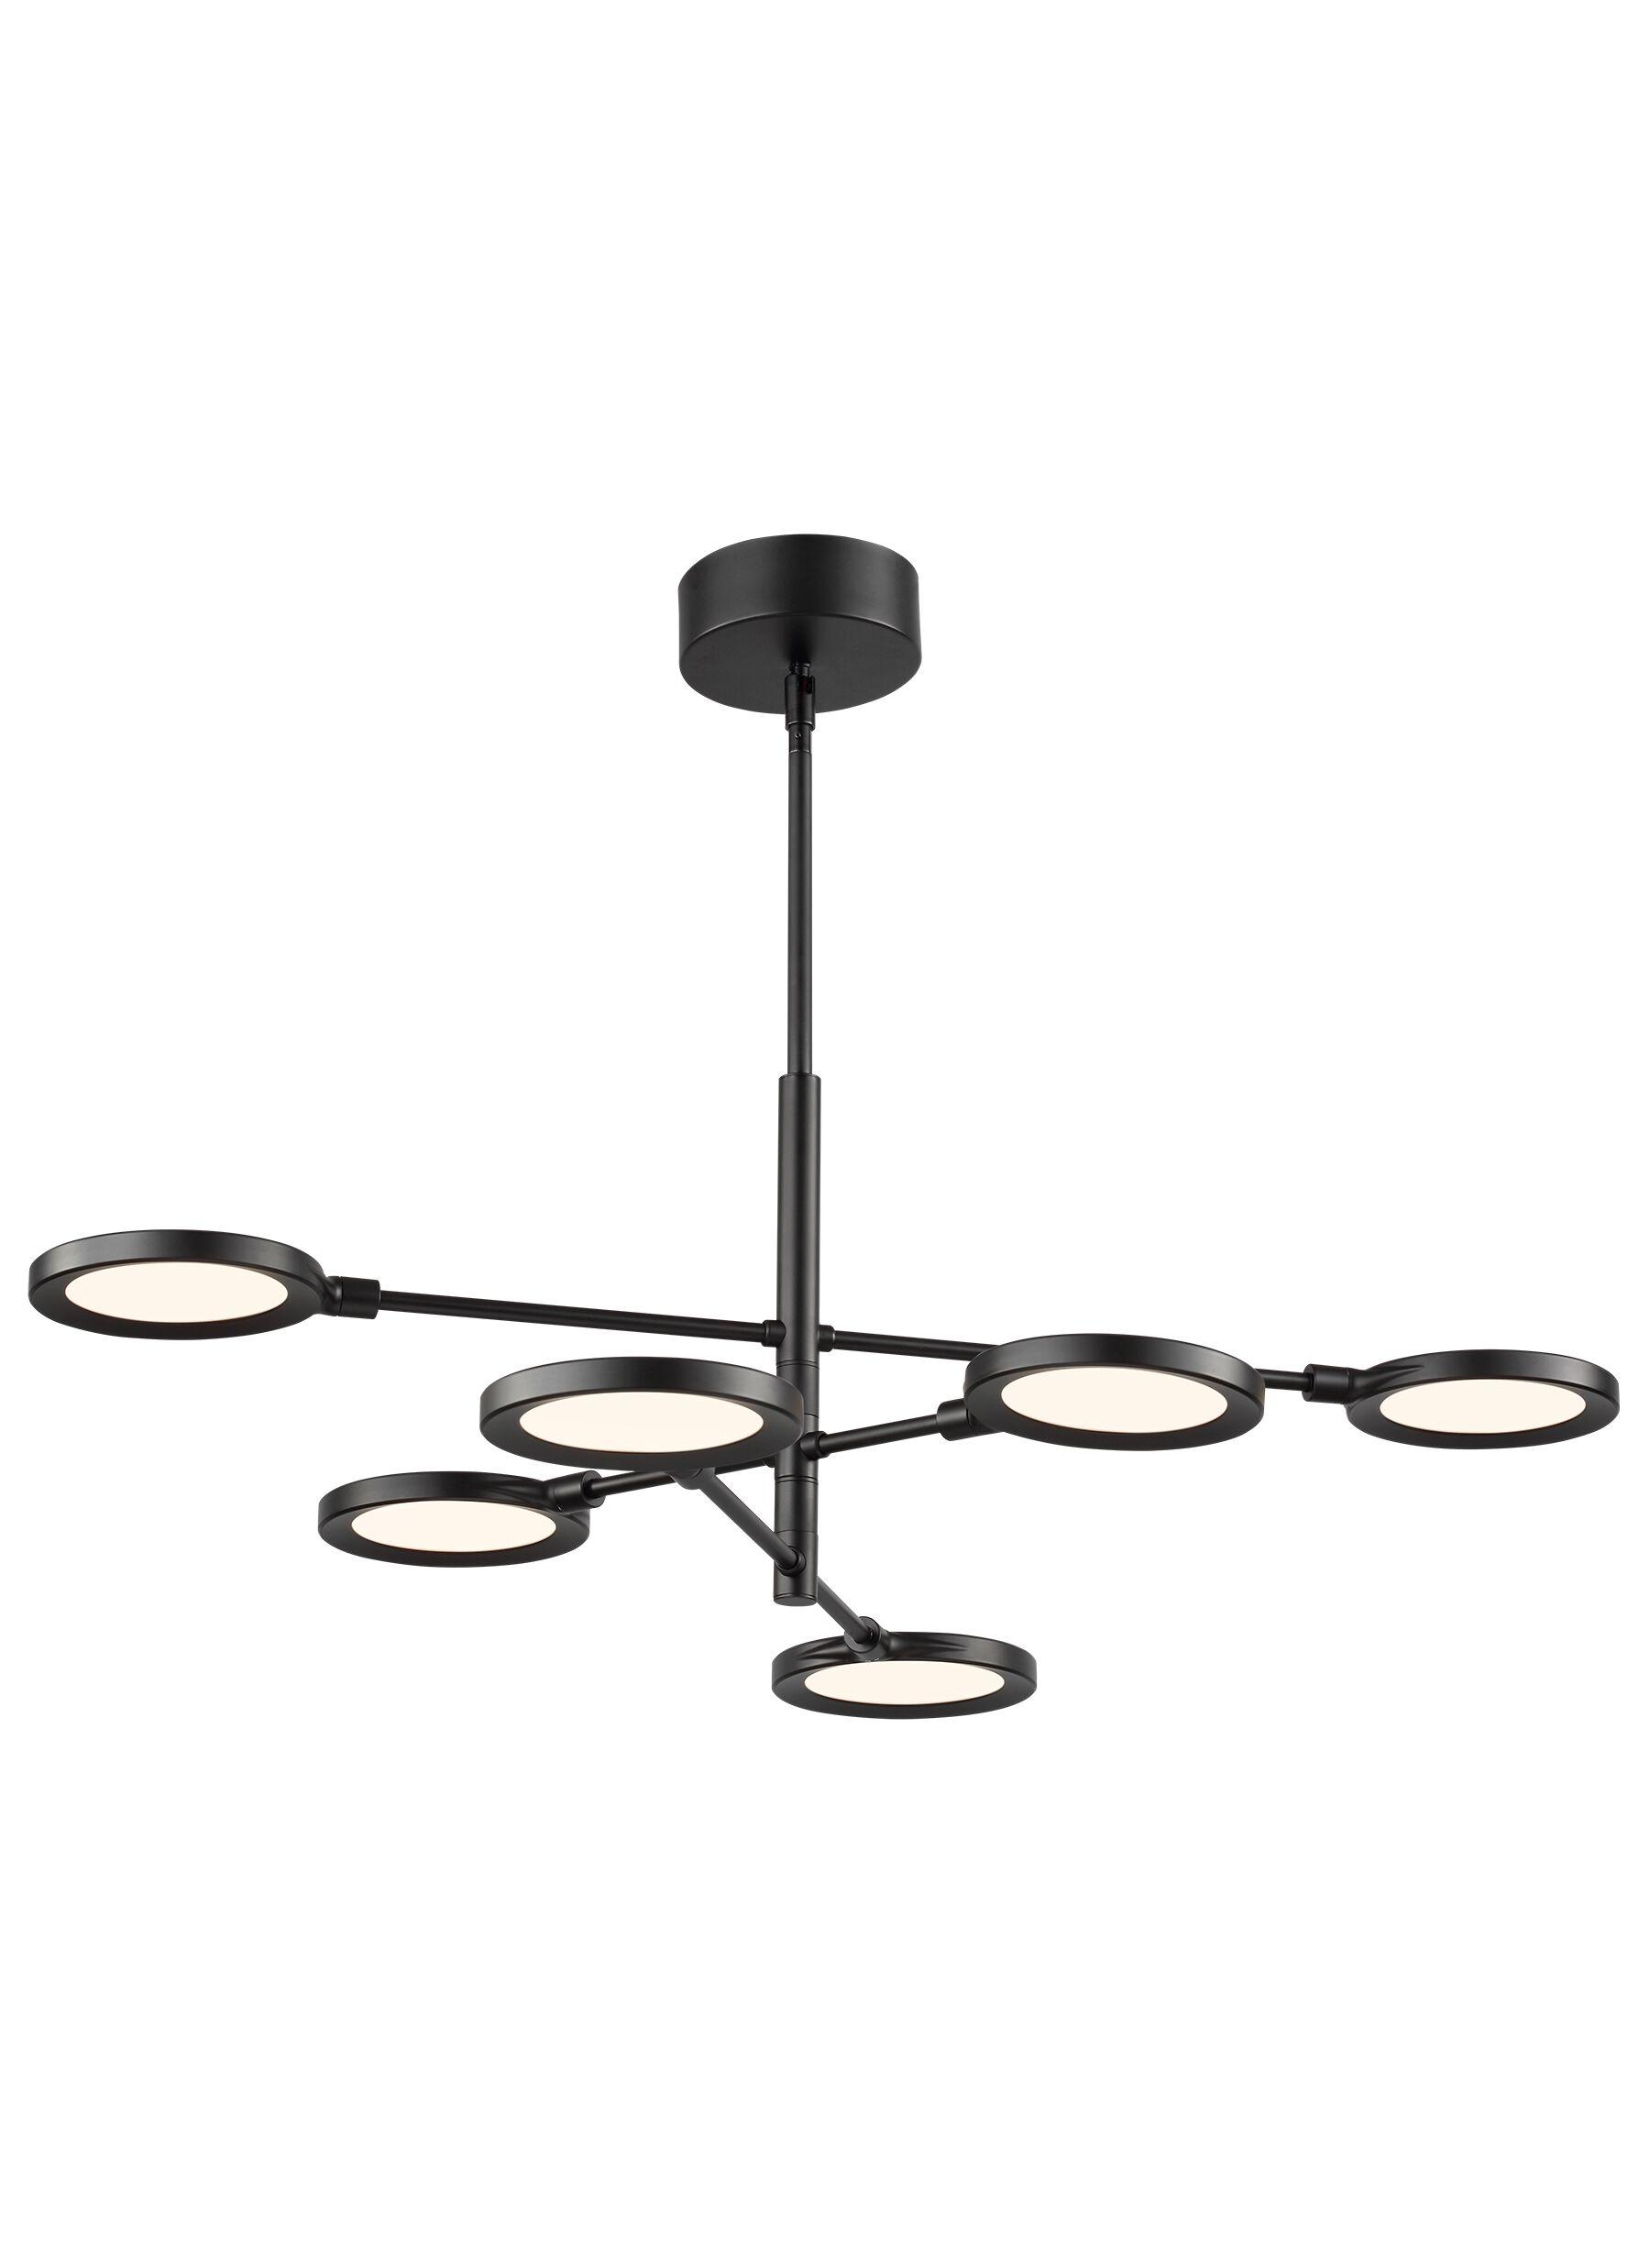 Kentwood 6-Light  LED  Chandelier Finish: Black